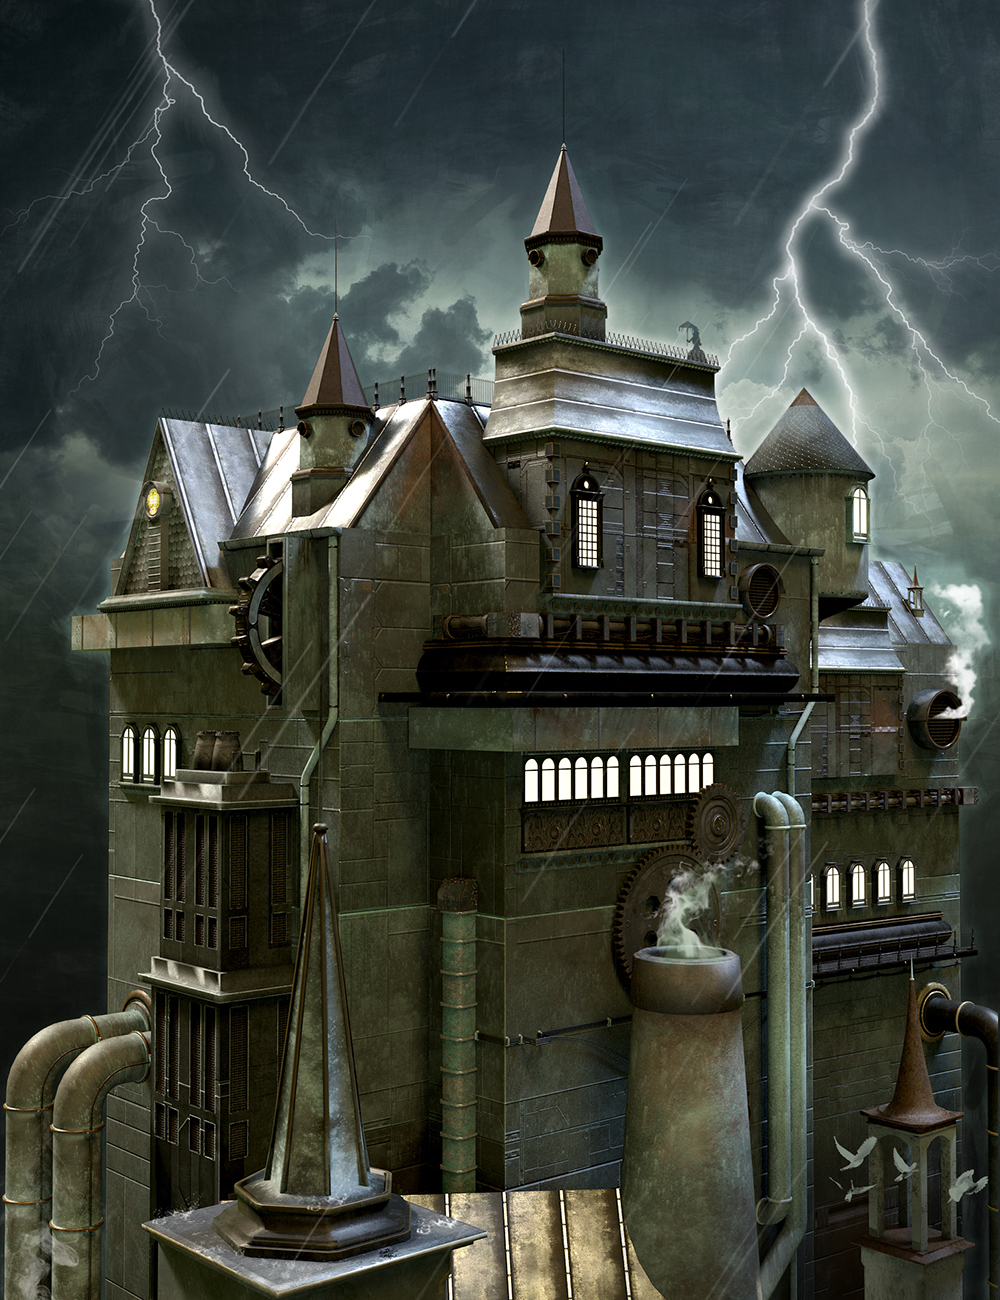 Victorian Steampunk Construction Set by: The AntFarm, 3D Models by Daz 3D